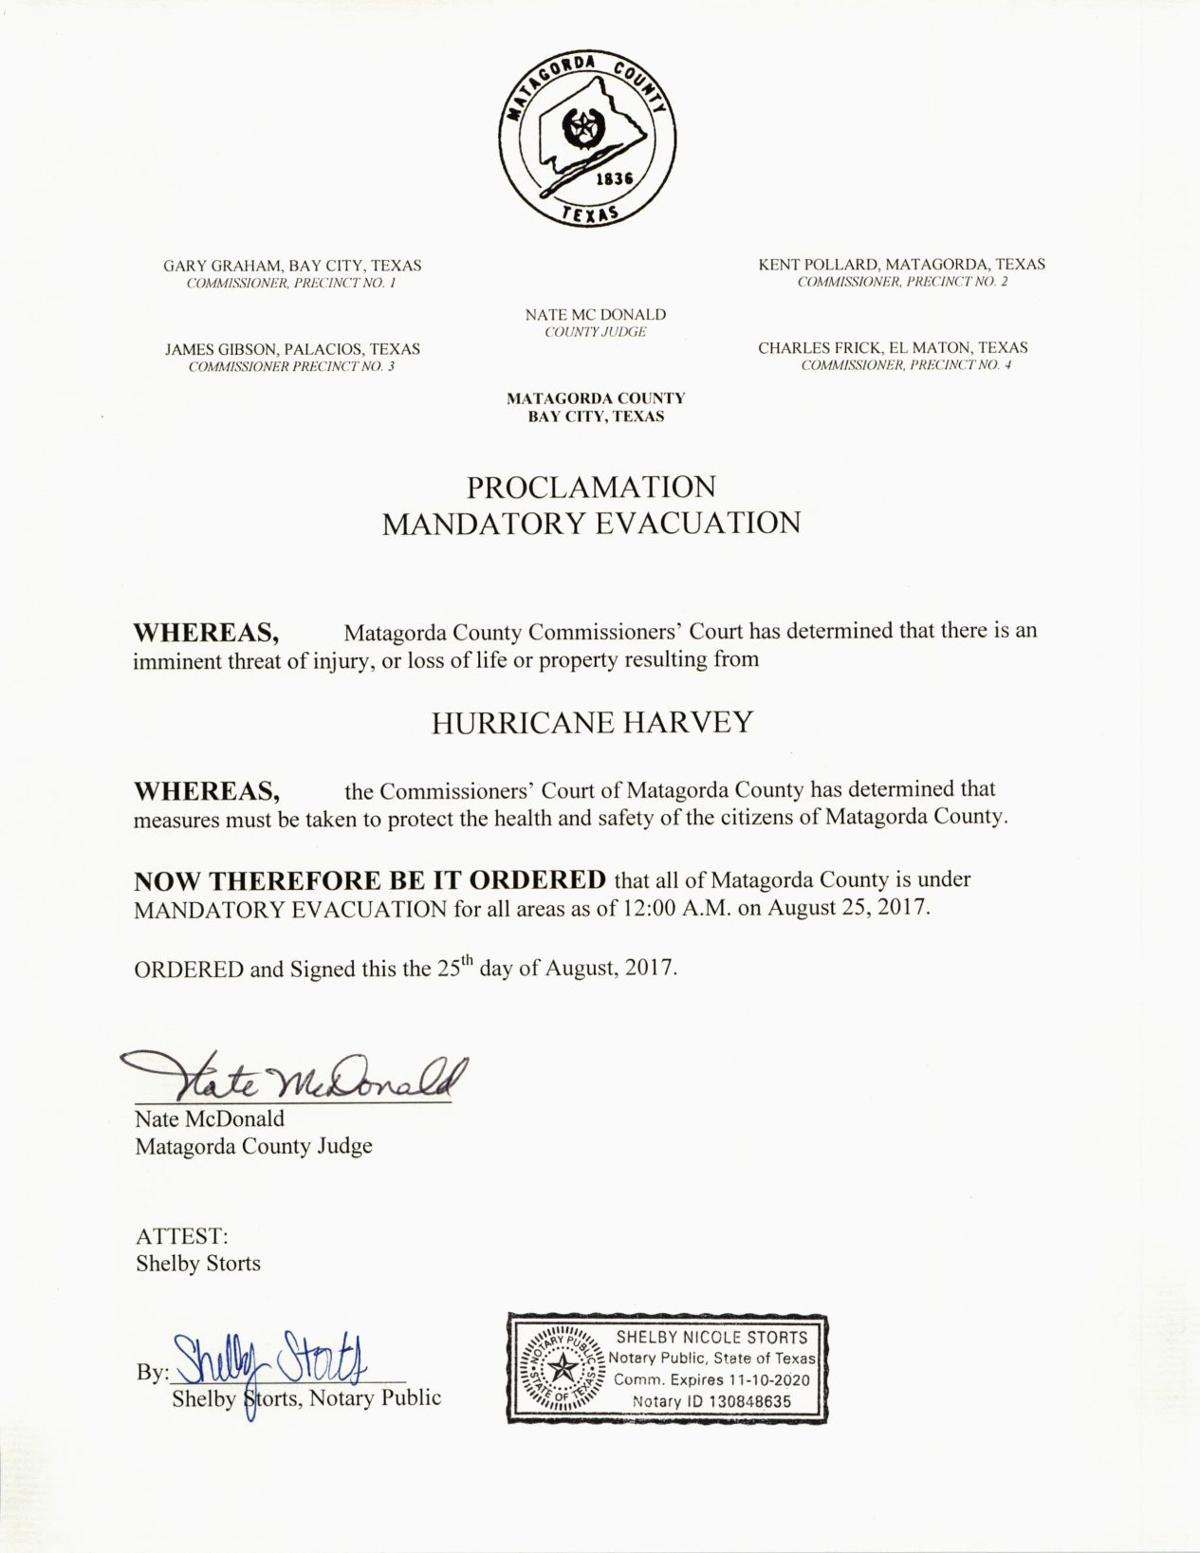 Judge Nate McDonald's evacuation order